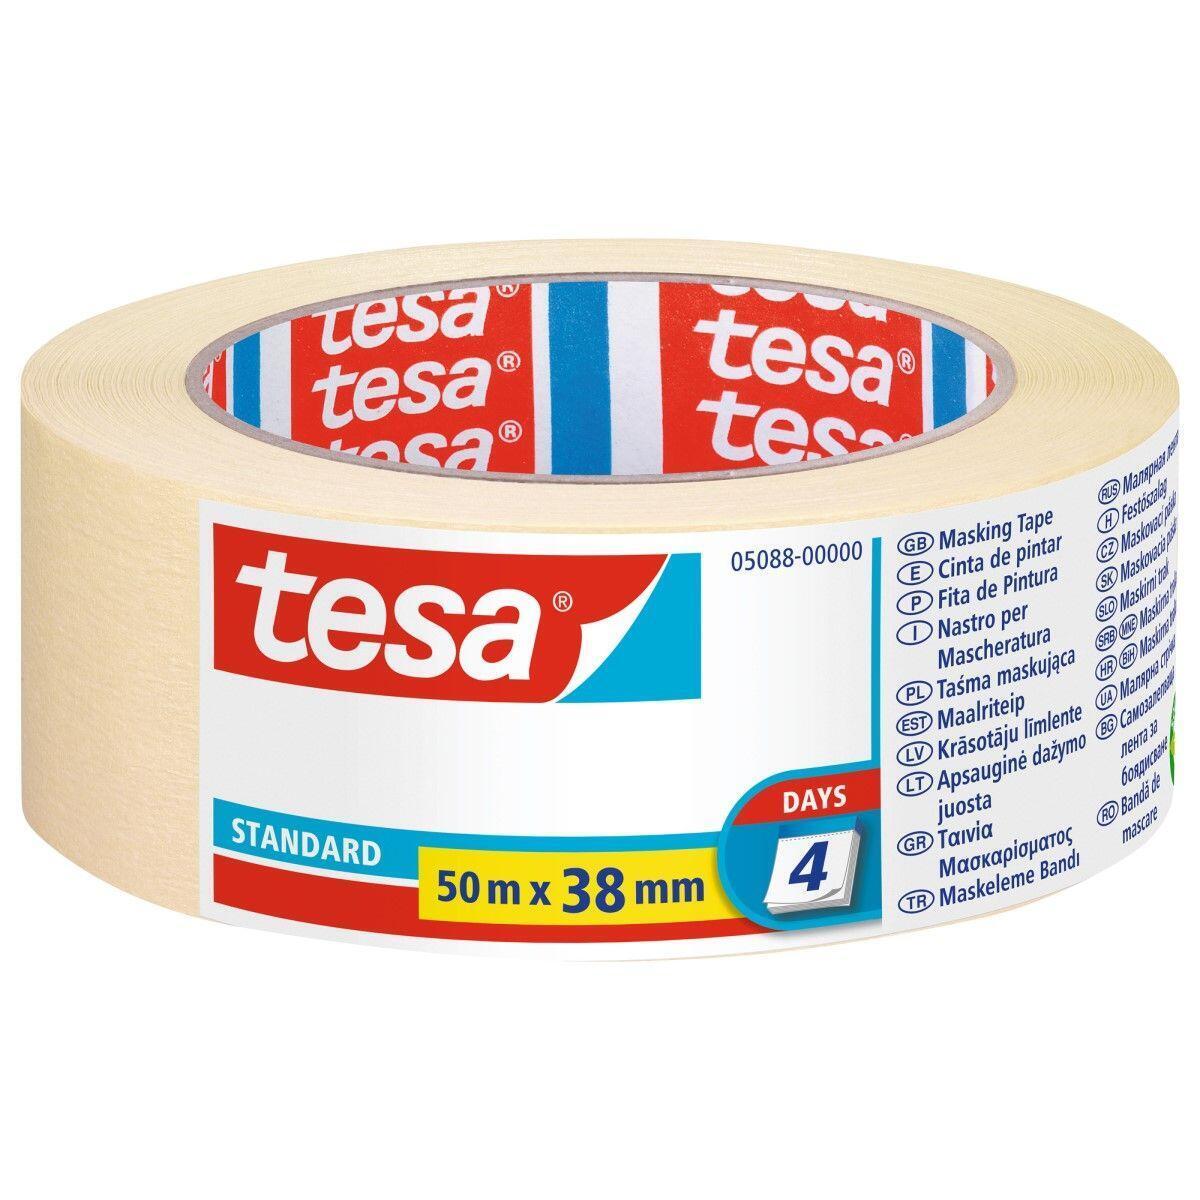 Nastro mascherante TESA General purpose 50 m x 38 mm superfici lisce